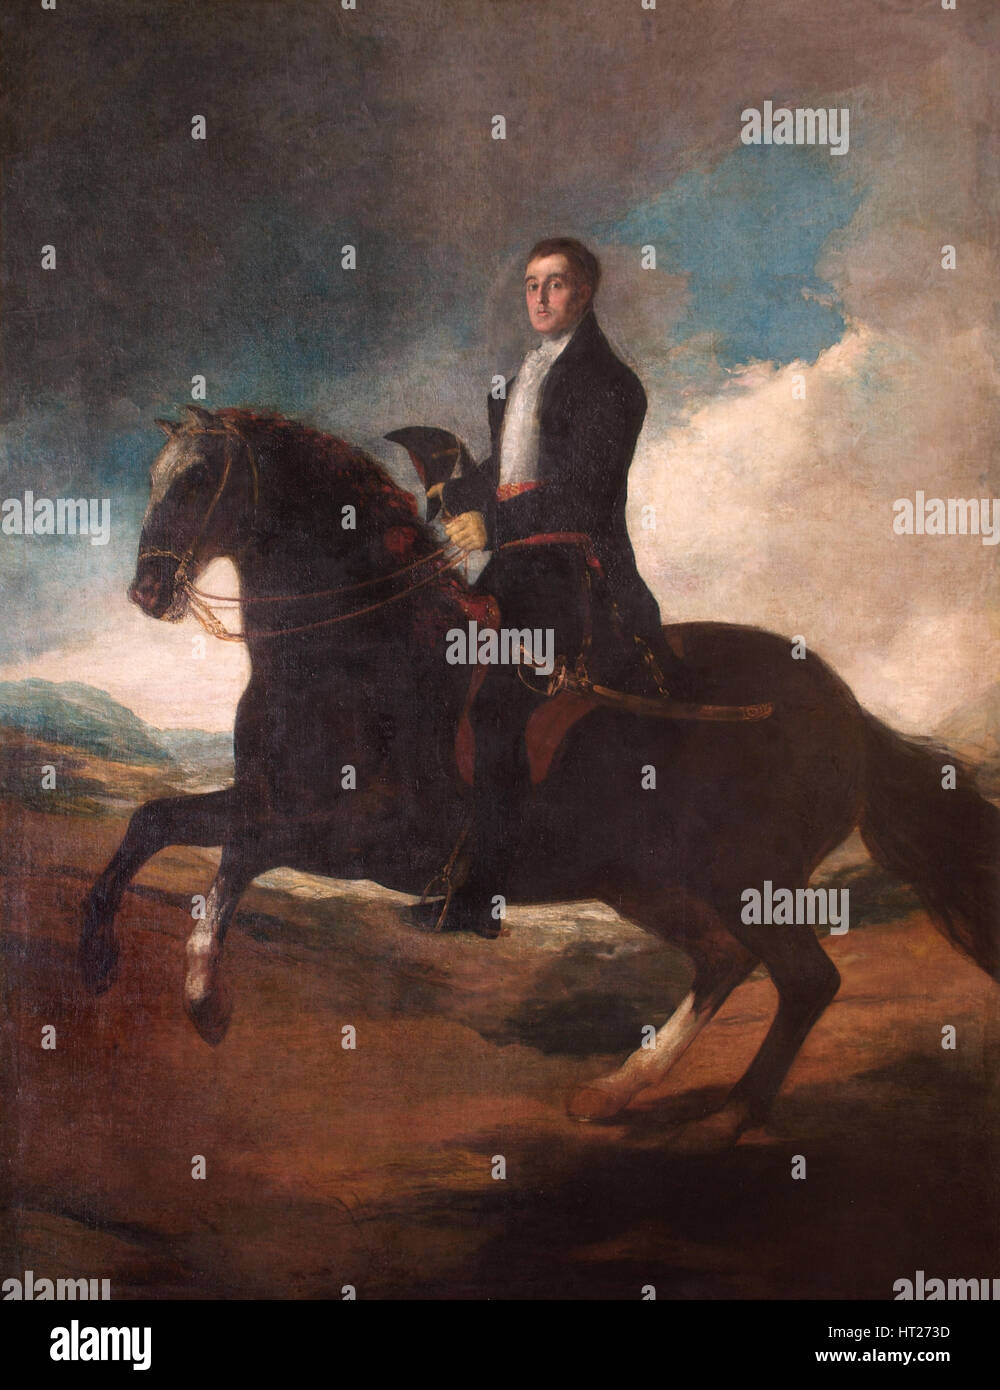 Equestrian portrait of the Duke of Wellington, 1812.  Artist: Francisco Goya. - Stock Image